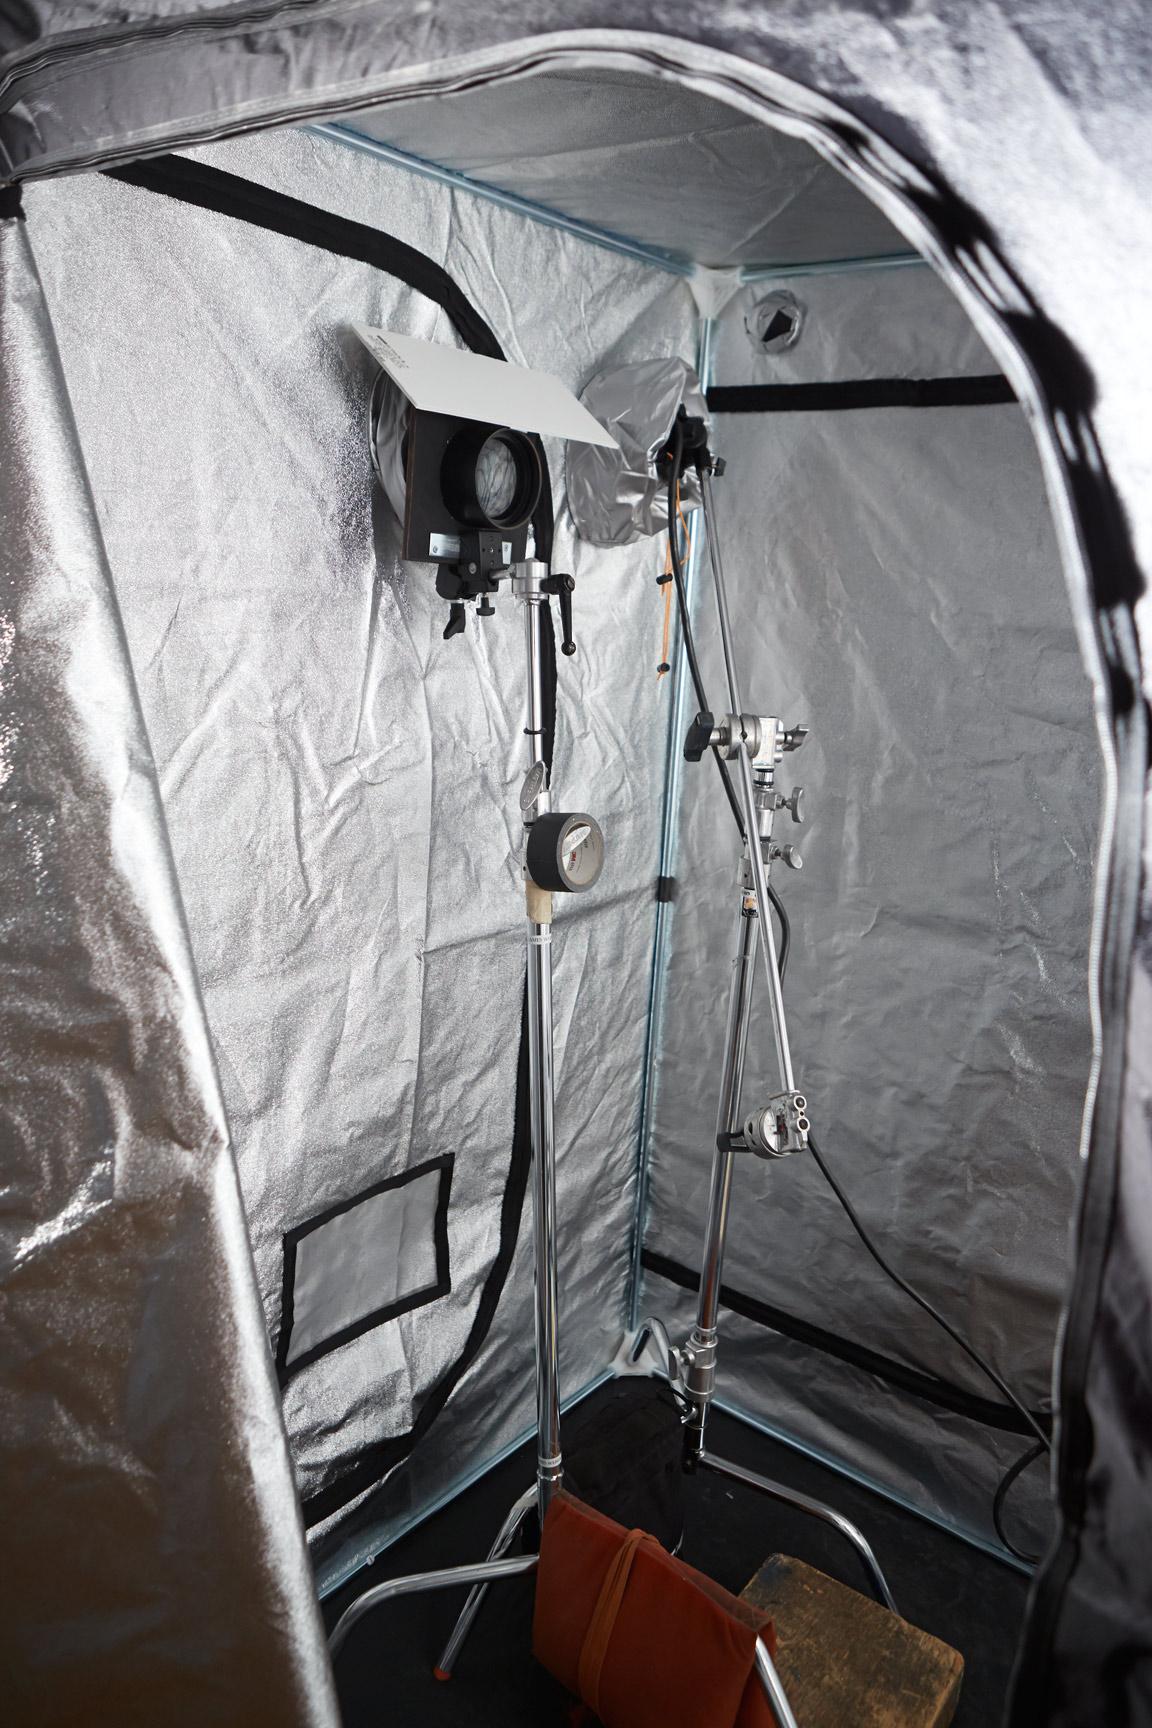 james-weber-wet-plate-camera-13510